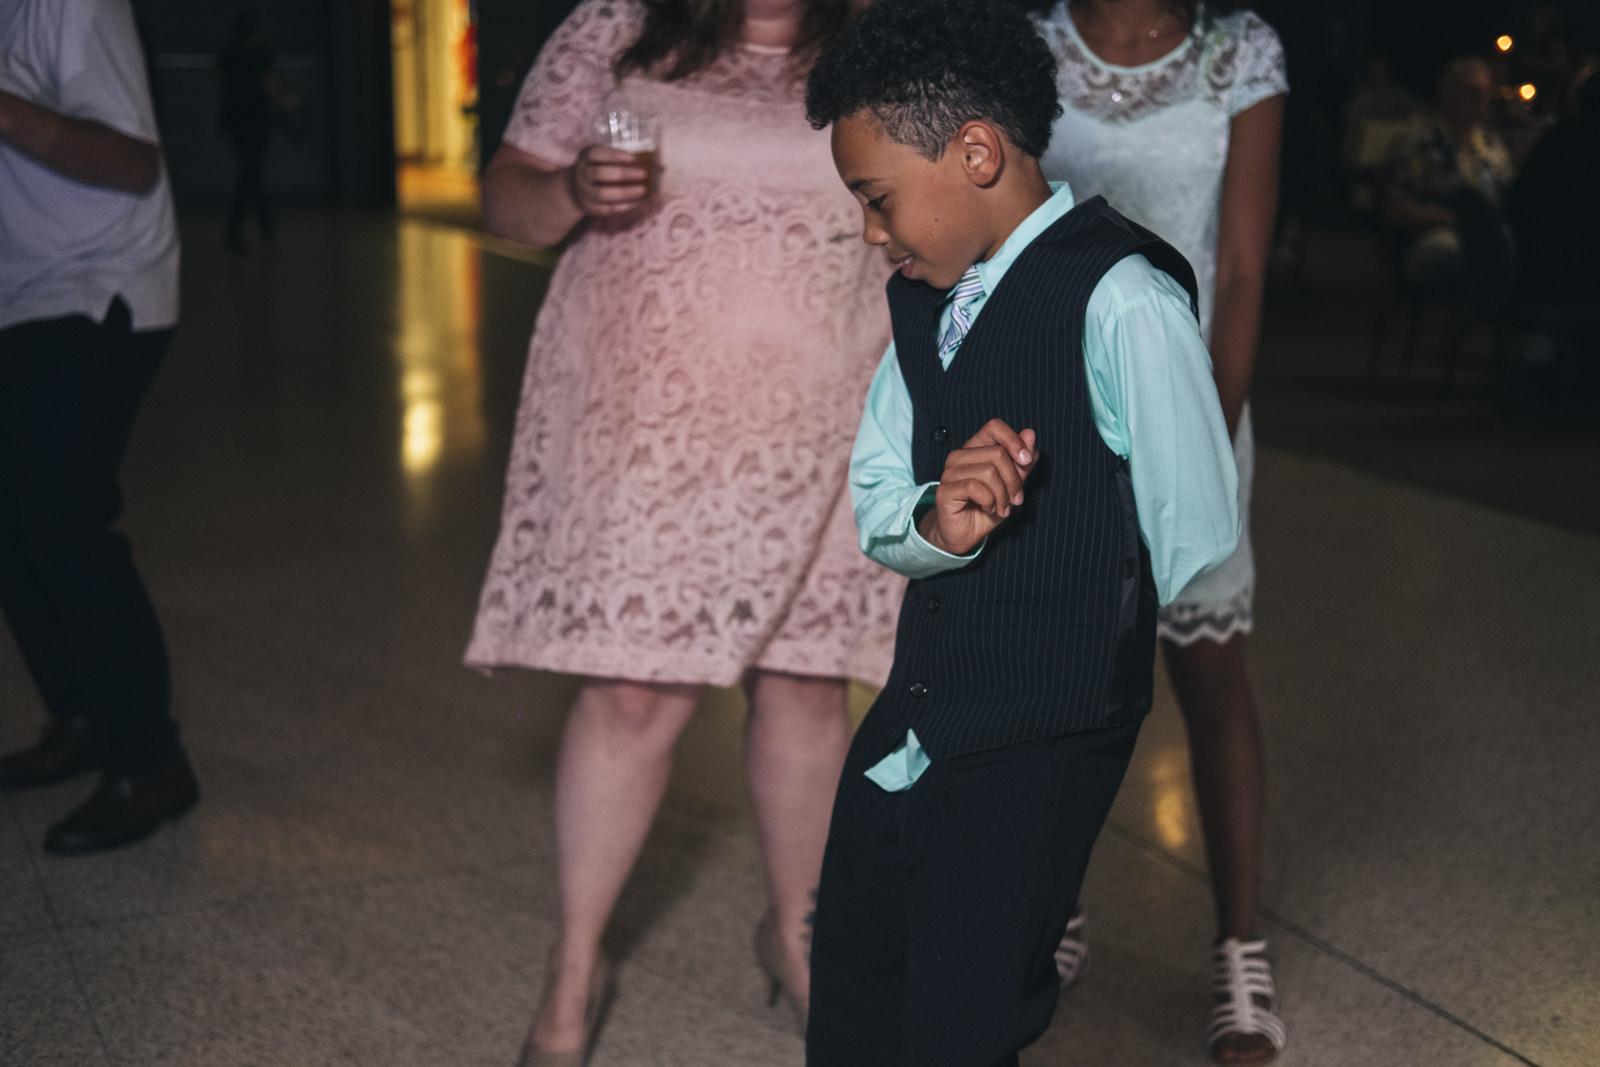 Little boy dances at his family's wedding reception.